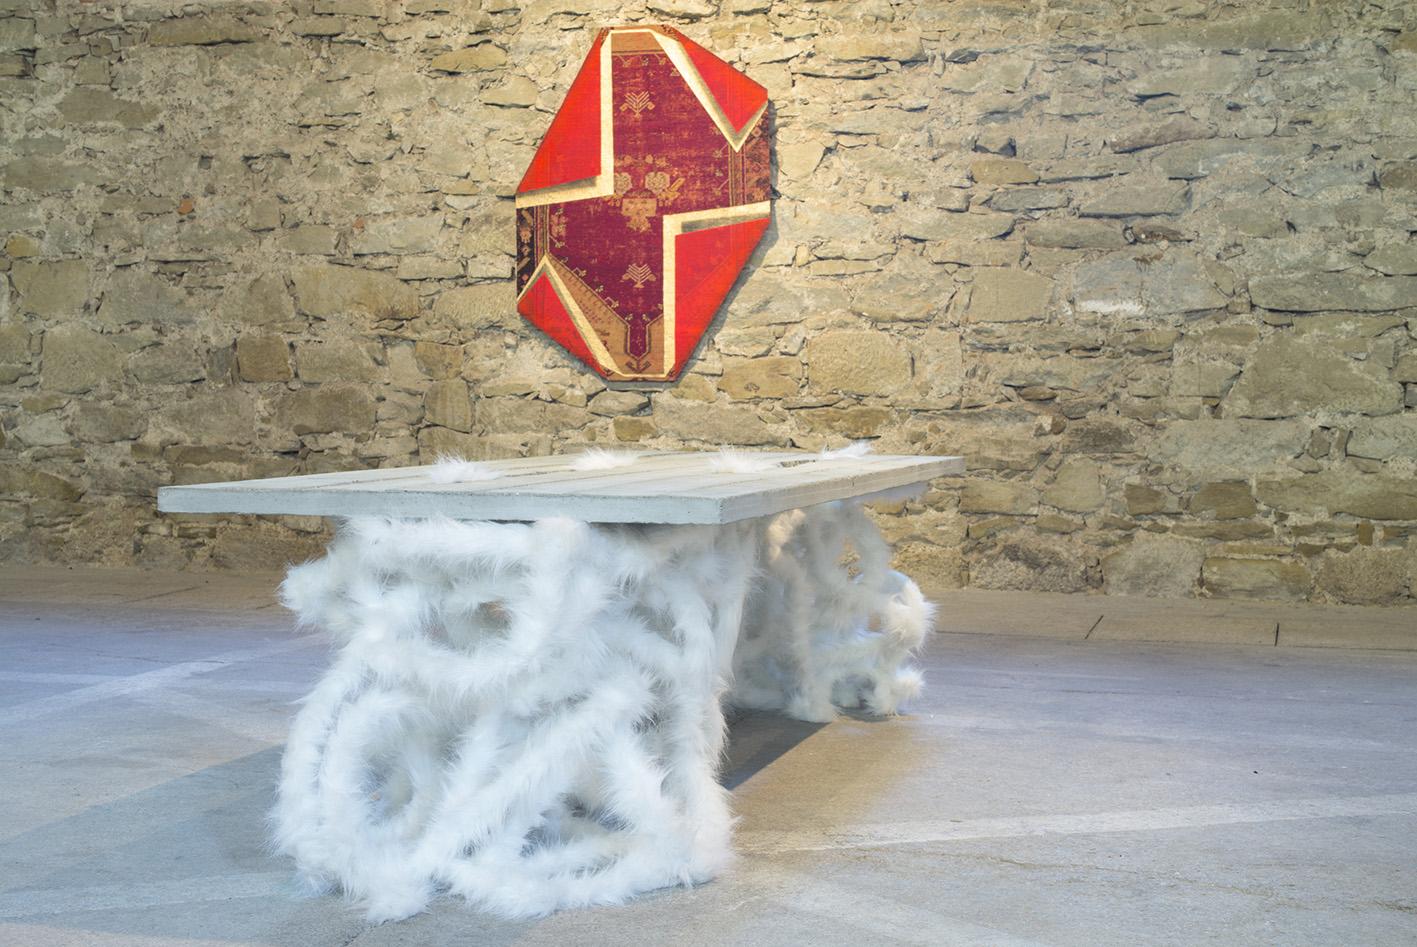 web-Hipphalle_MarionFriedmannGallery_exhibit_Noemi_Kiss_installation_view_photo_FelixFriedmann368.jpg